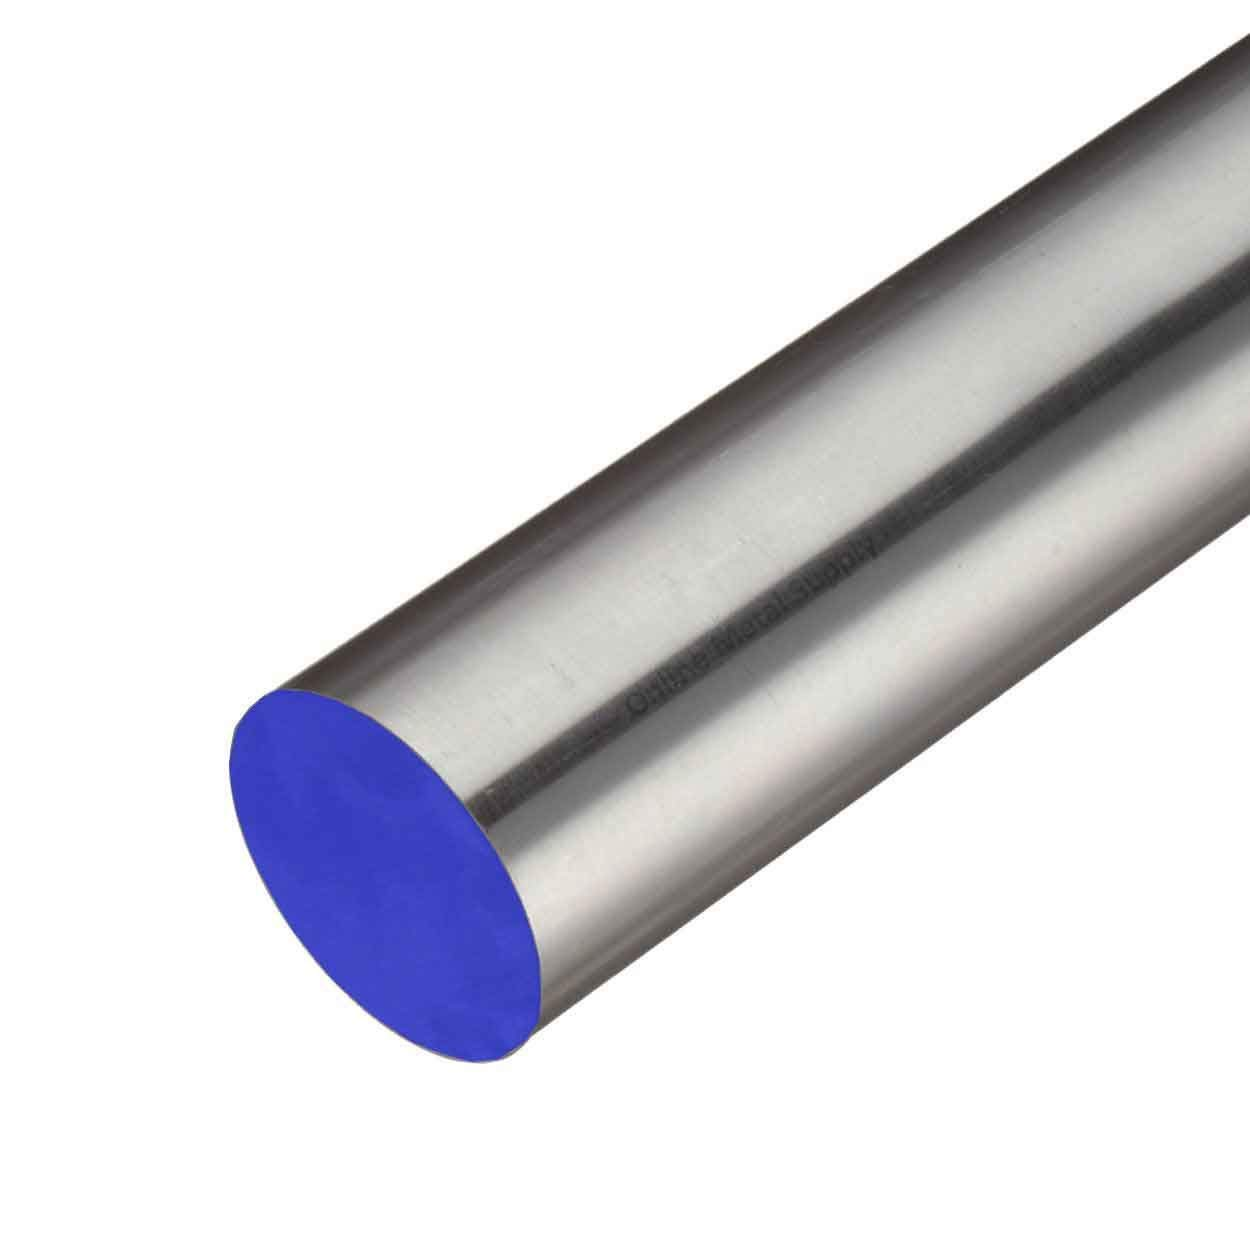 Online Metal Supply 304 Stainless Steel Round Rod, 1.750 (1-3/4 inch) x 10 inches by Online Metal Supply